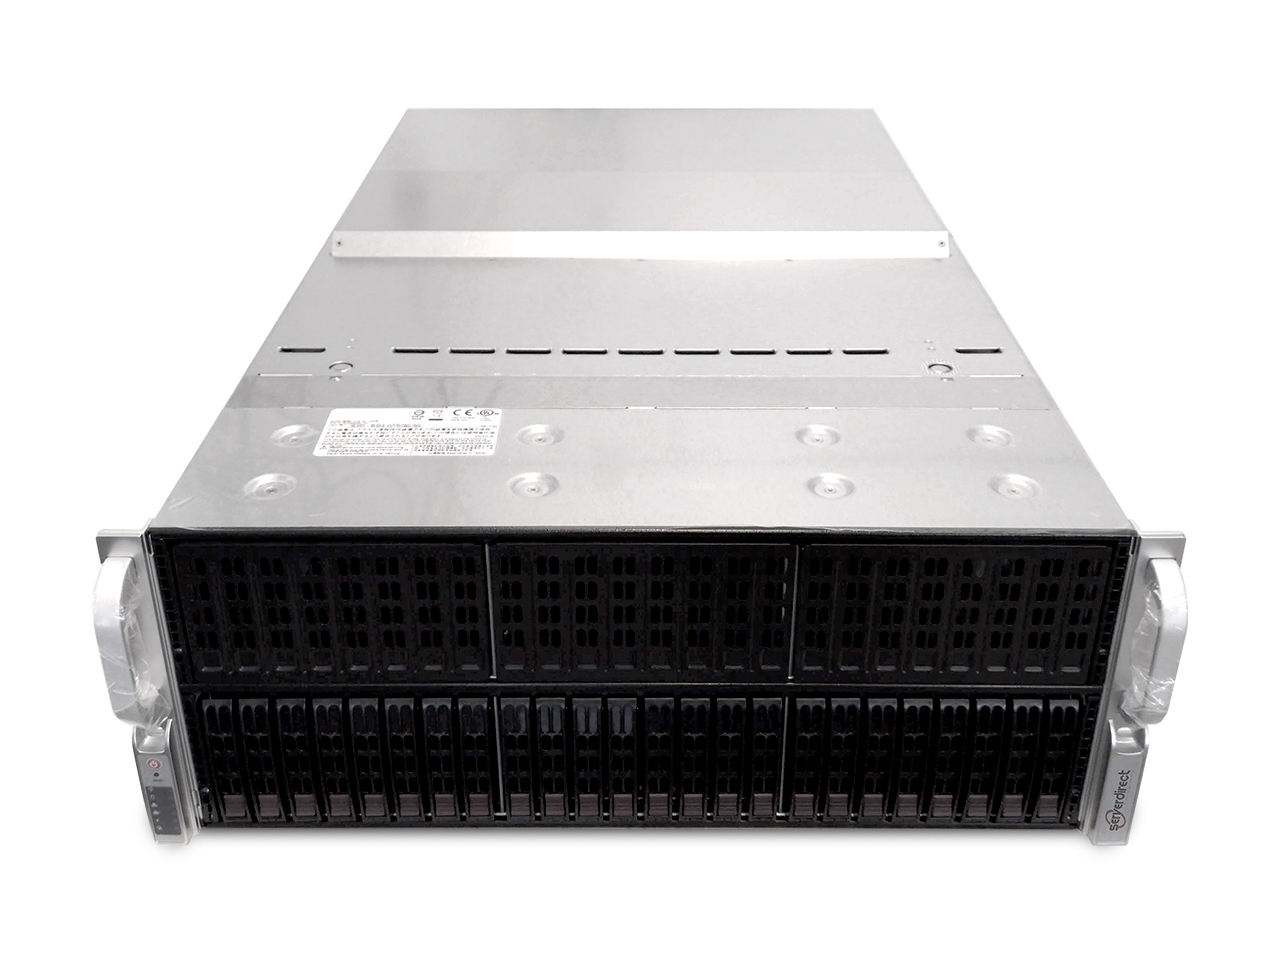 ServerDirect 4U GPU Server, 10 GPU's, 8x 16GB DDR4, 2x Intel Xeon E5-2697V4, 1x 256GB Storage (Configureerbaar)